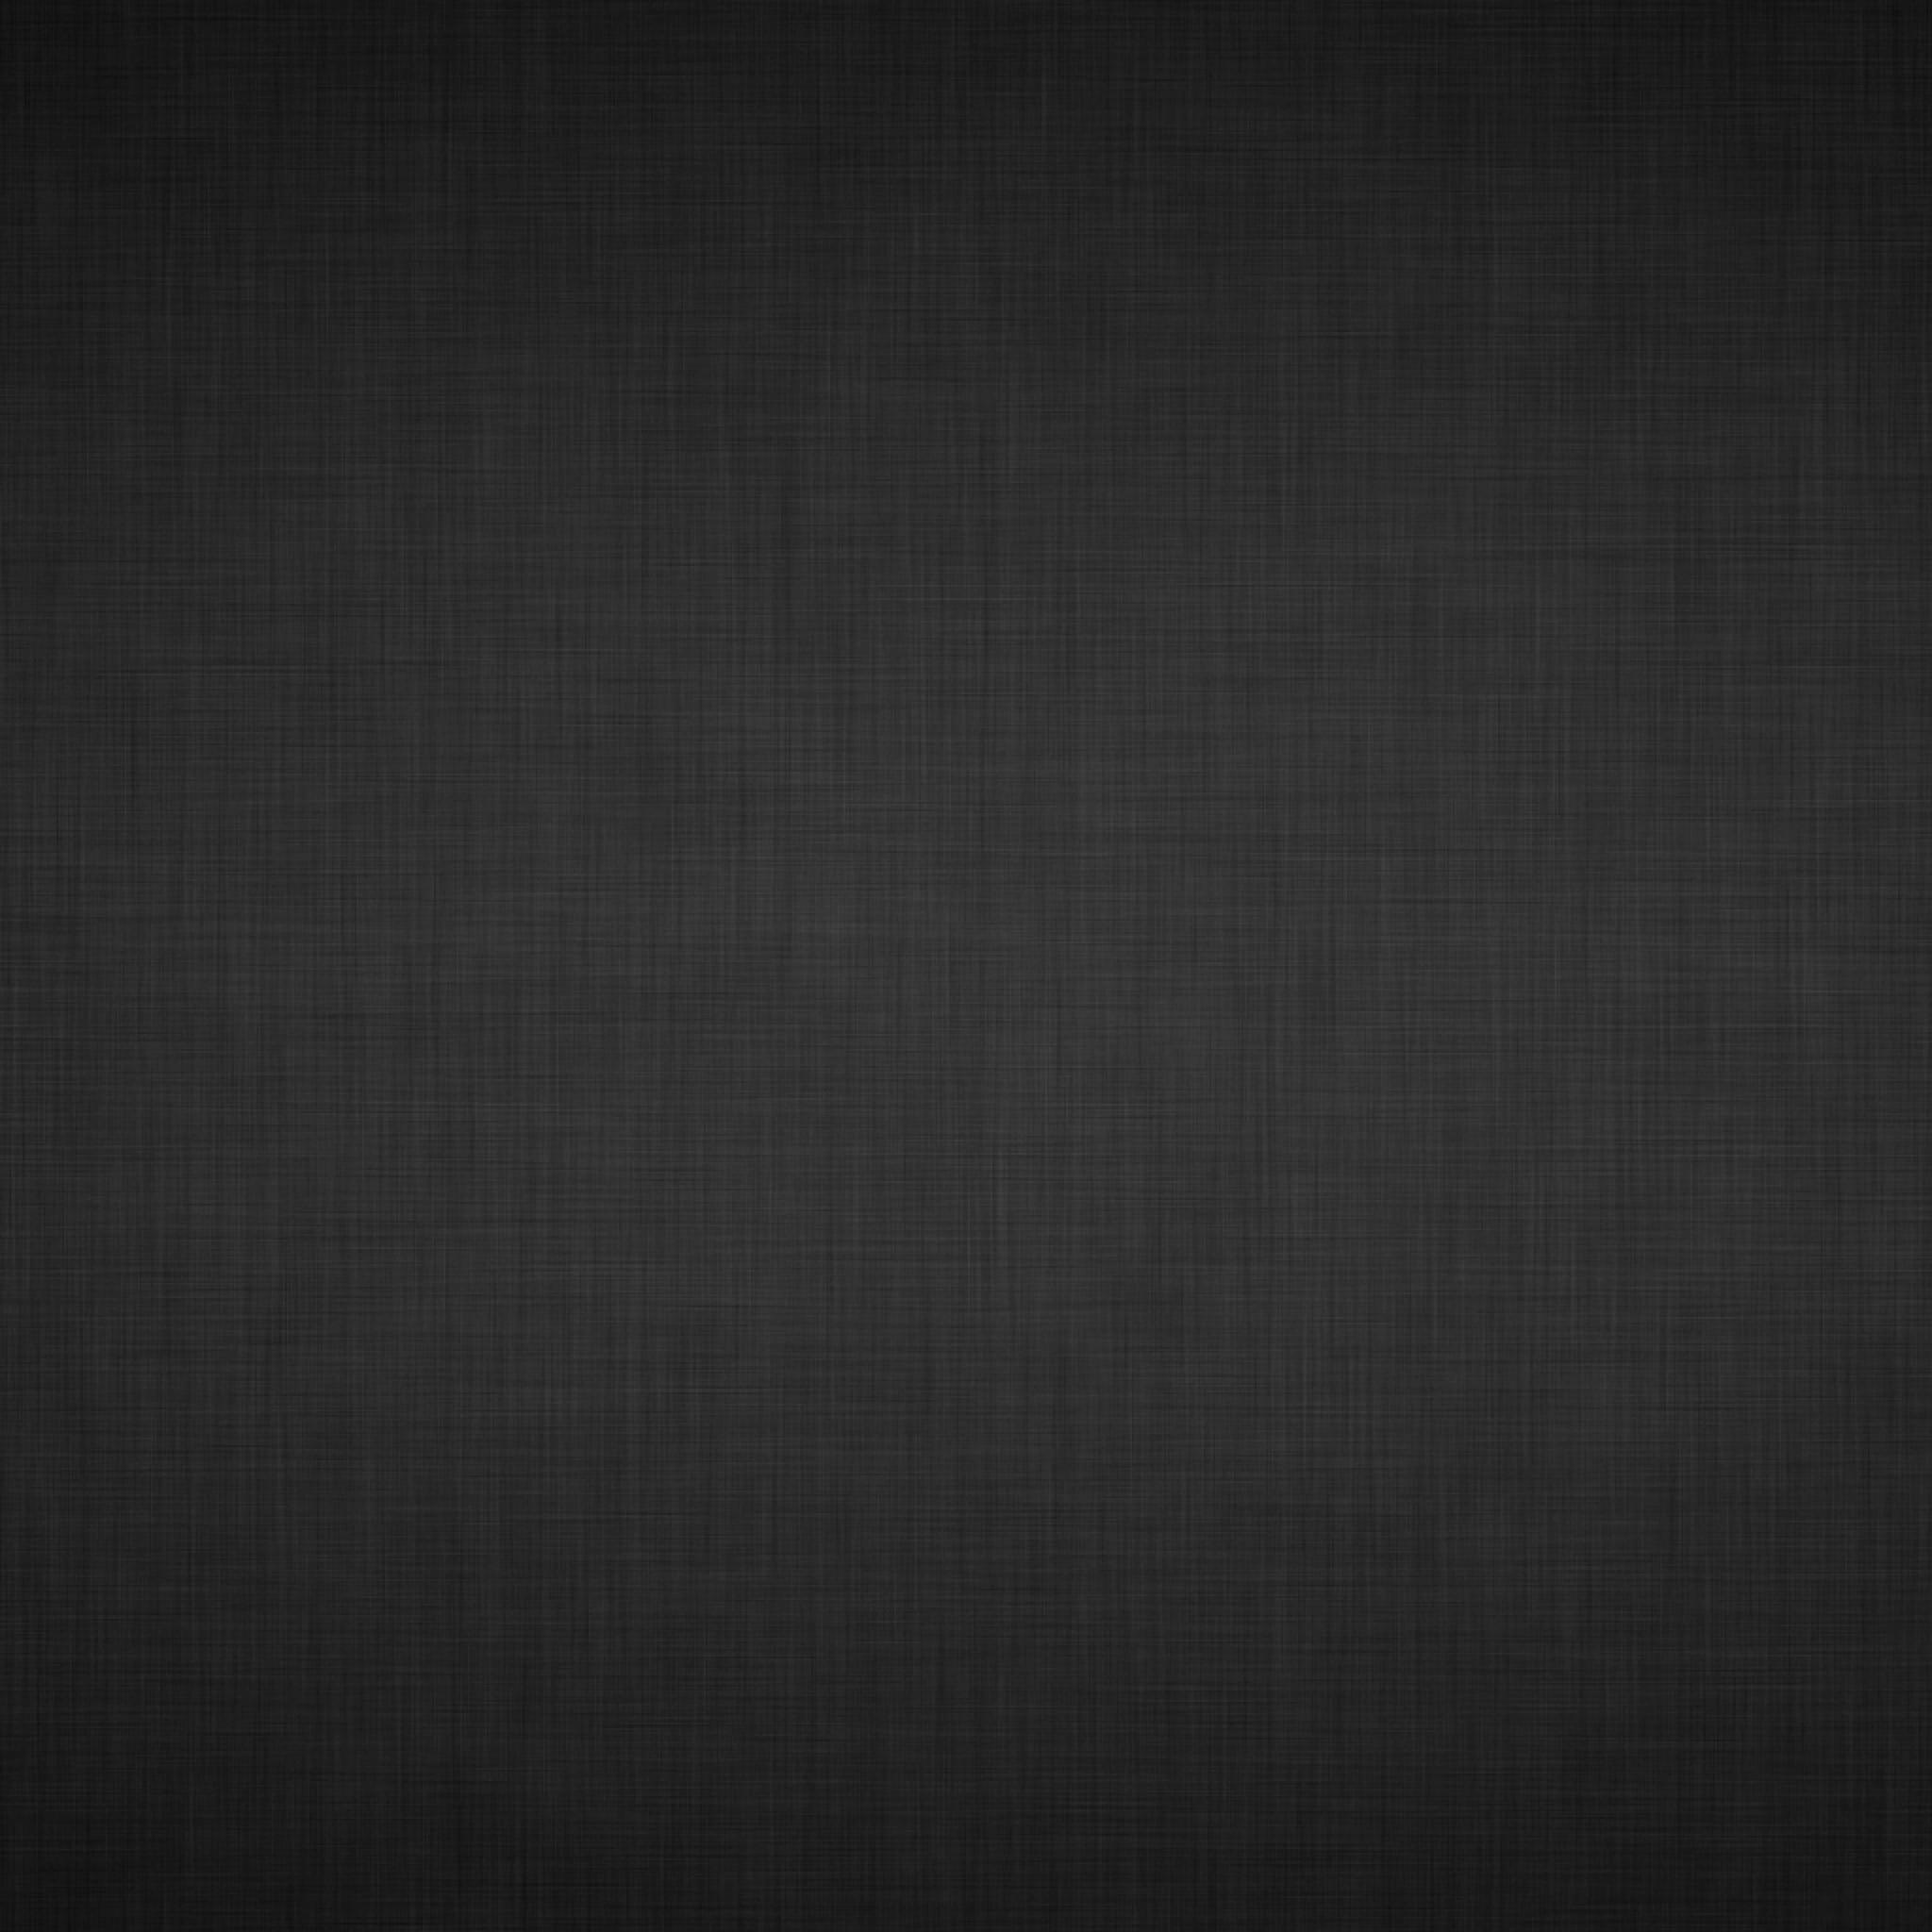 live wallpaper for ipad mini 56 images